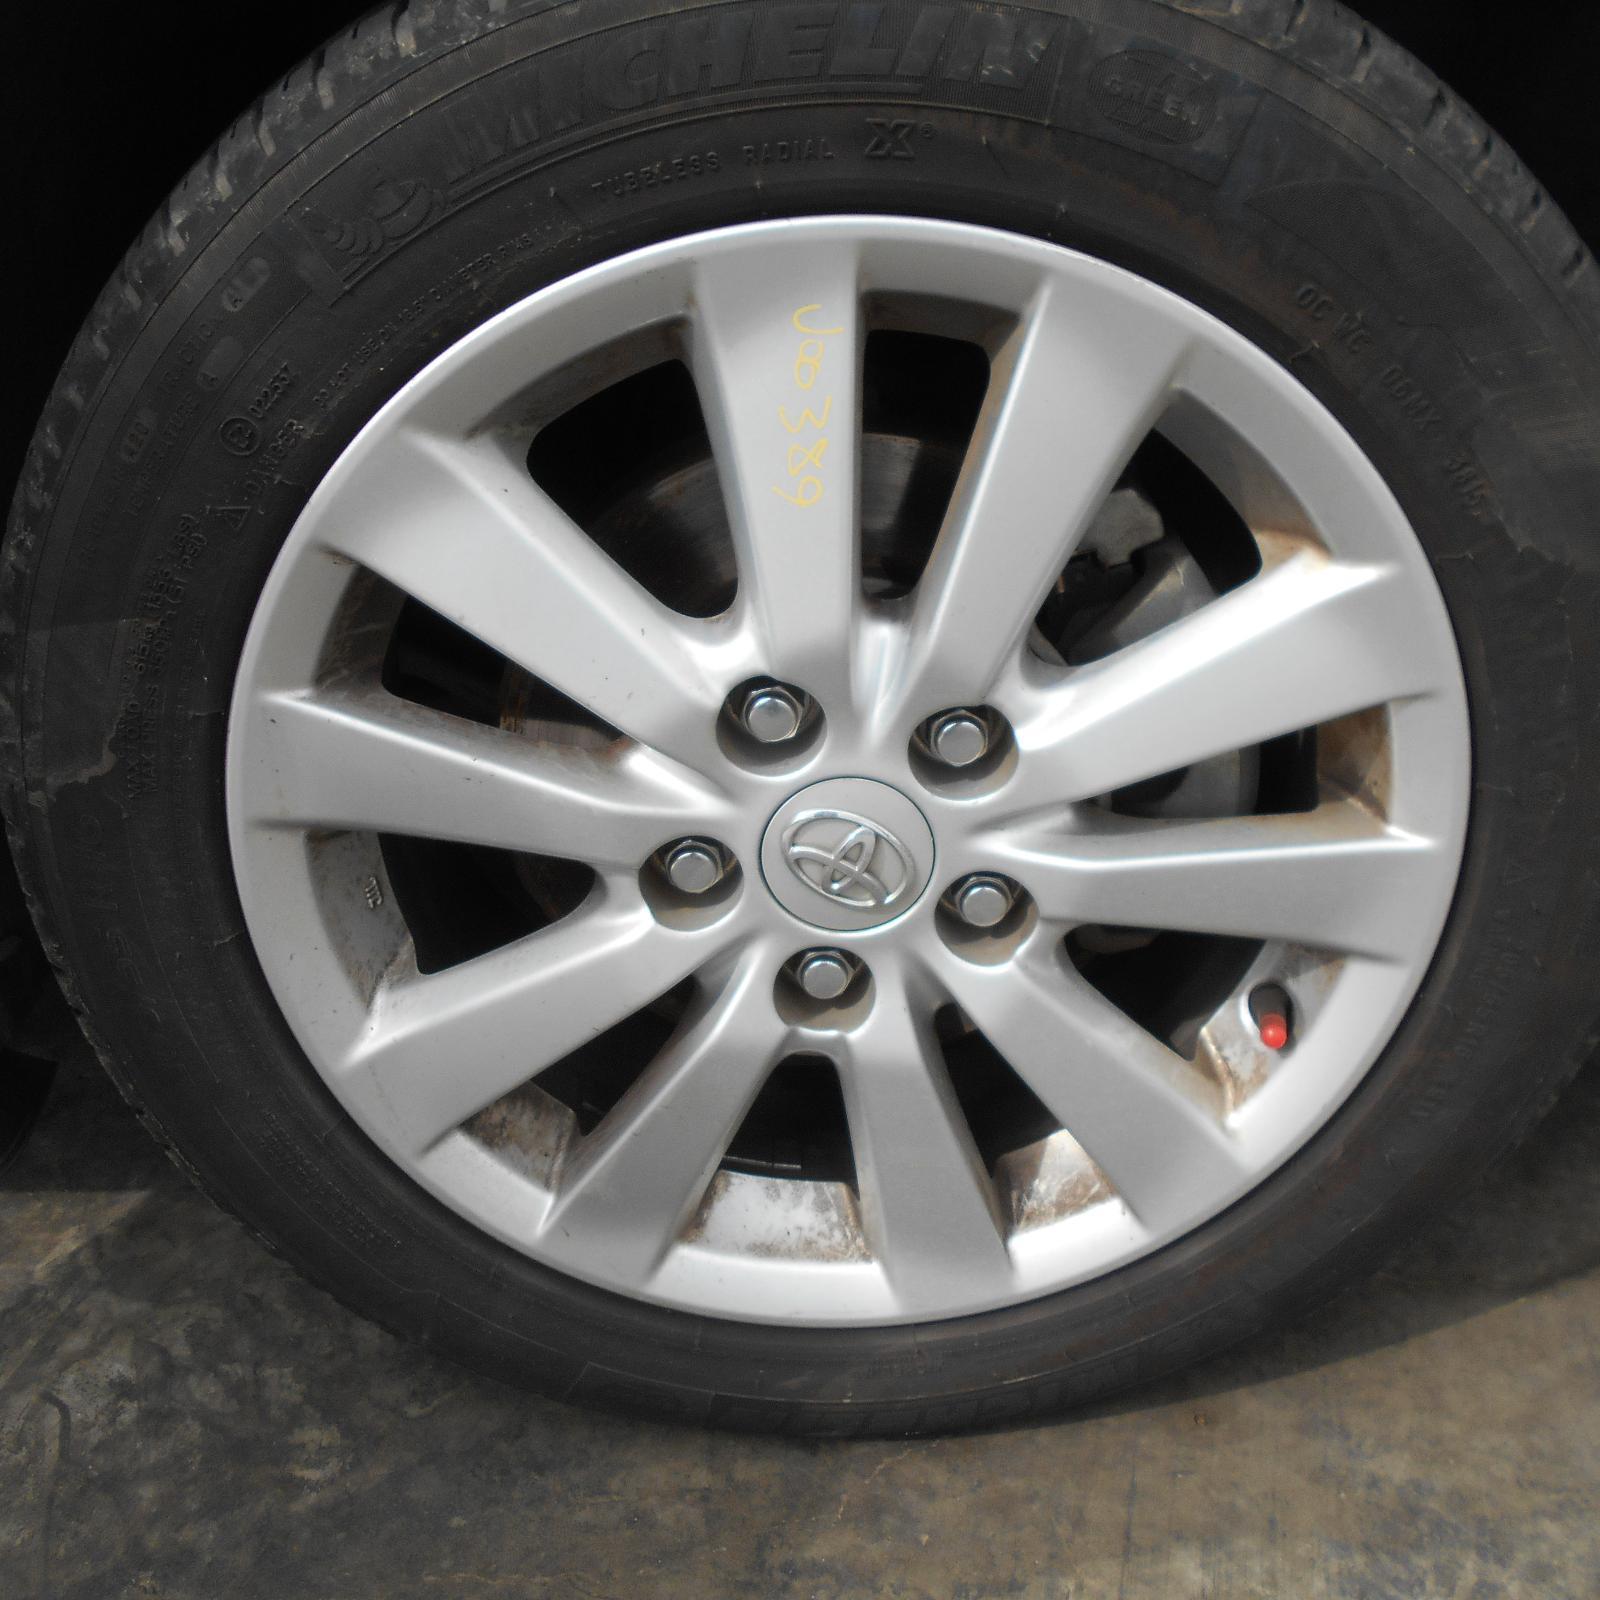 TOYOTA COROLLA, Wheel Mag, FACTORY, 16X6.5IN, ZRE152/153R, 5 V SPOKE, 03/07-10/13